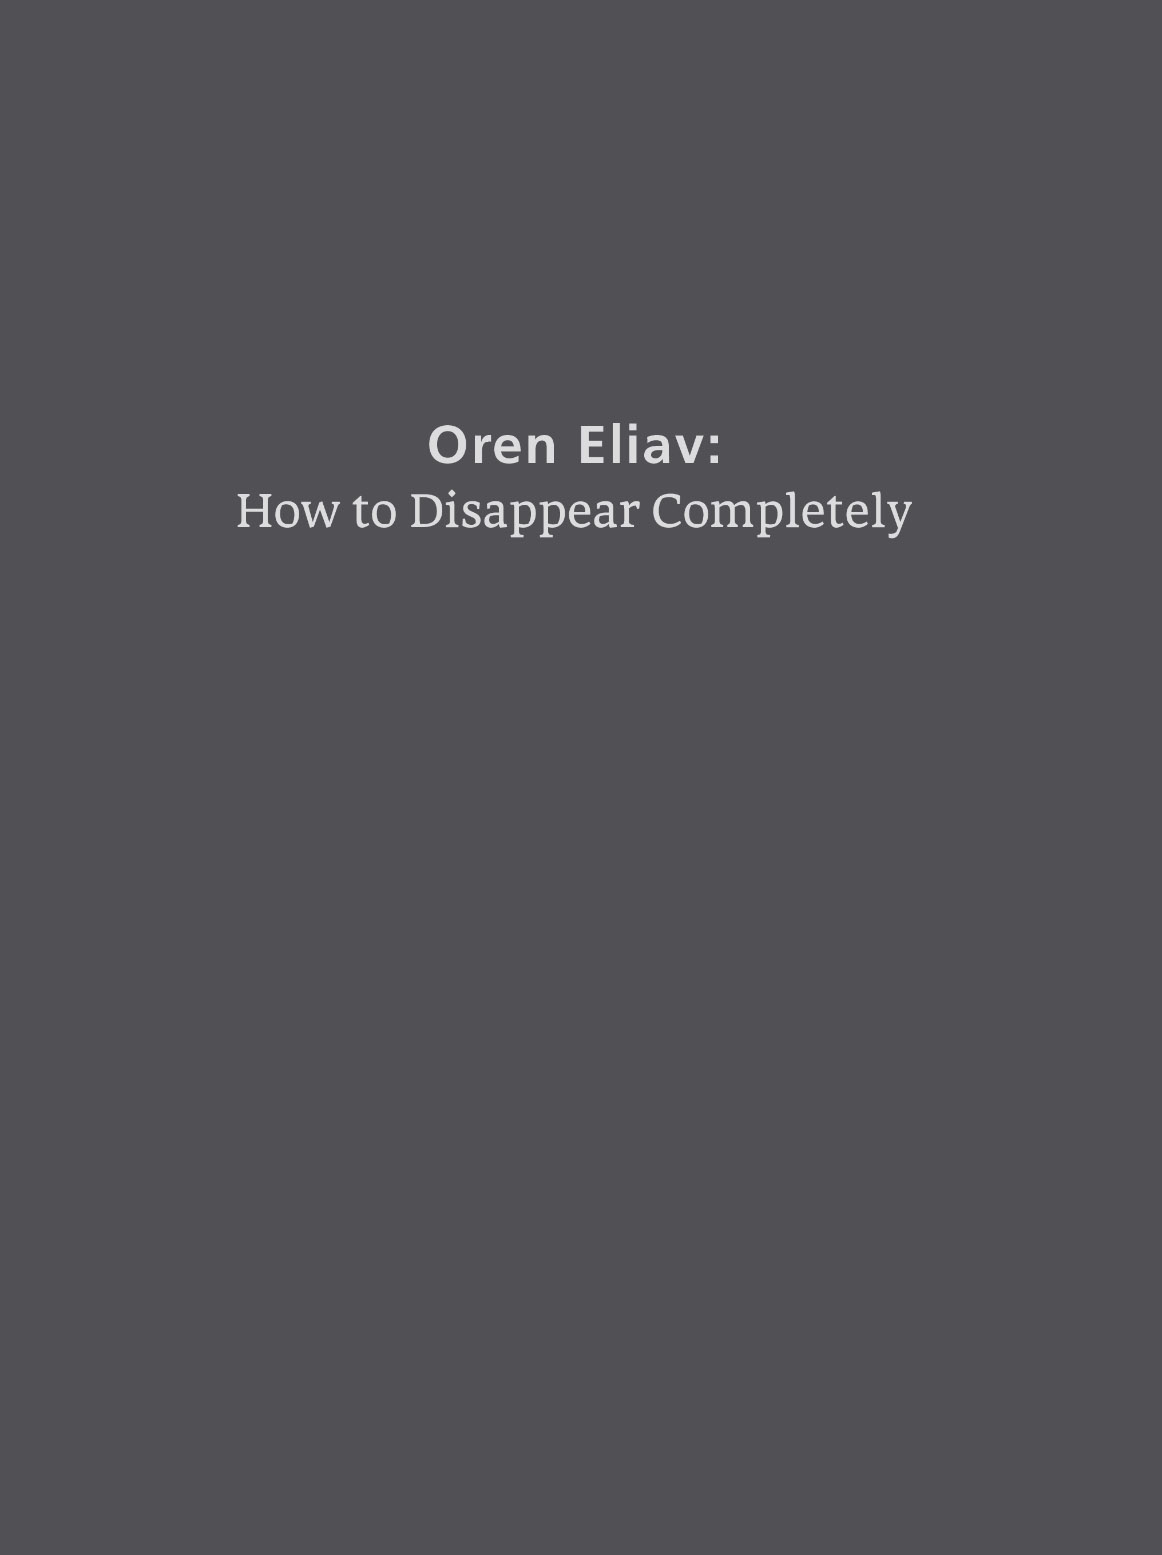 Oren Eliav: How To Disappear Completely